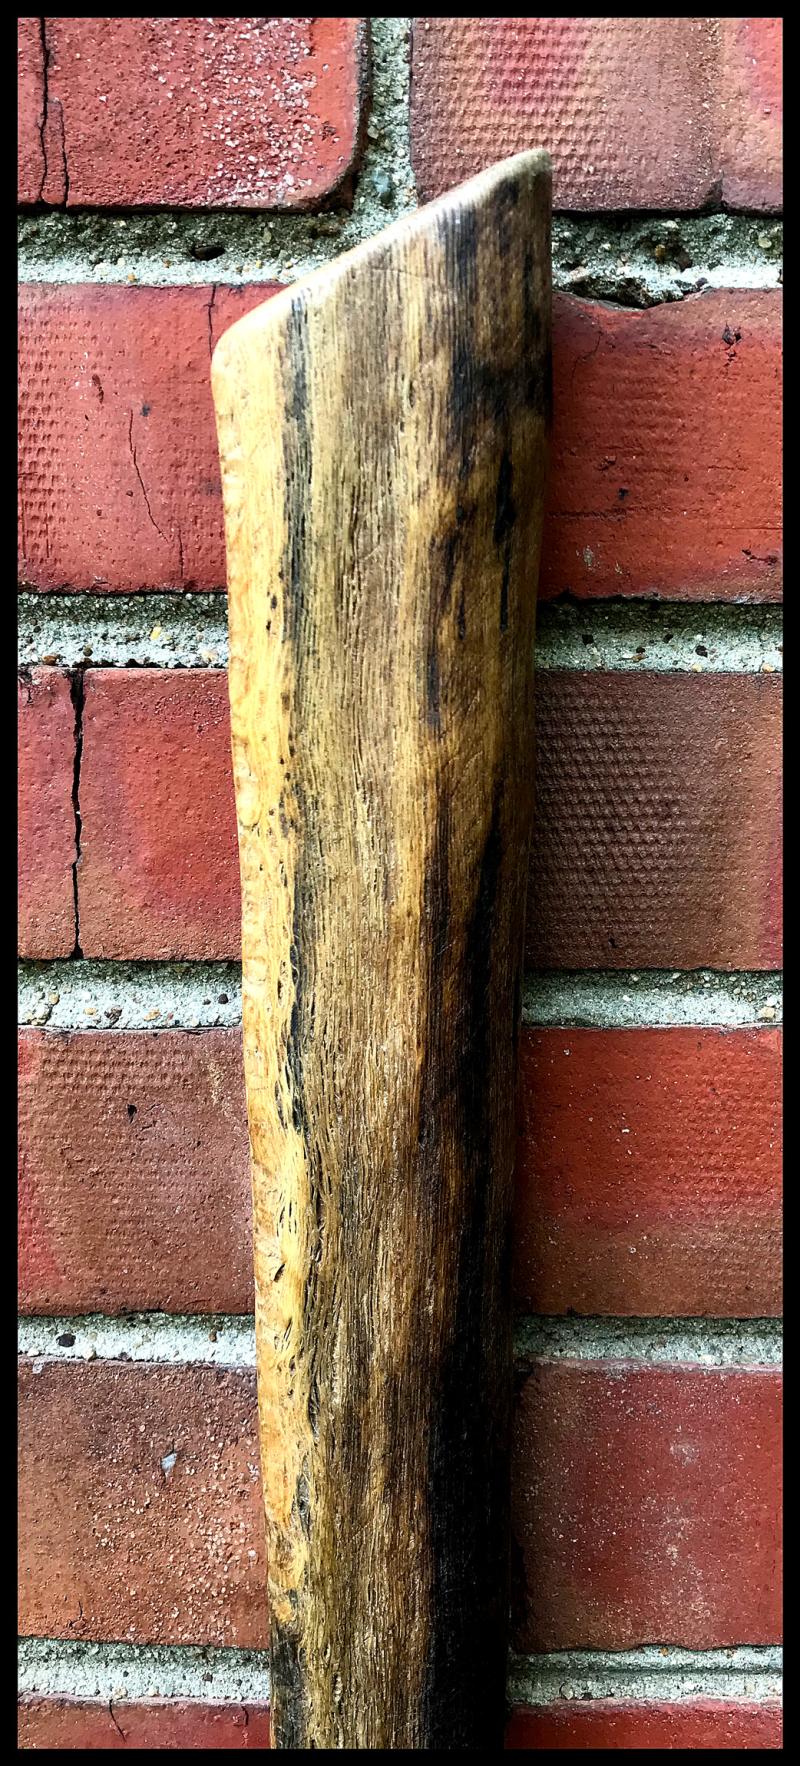 Hamish-Detail-One-#19